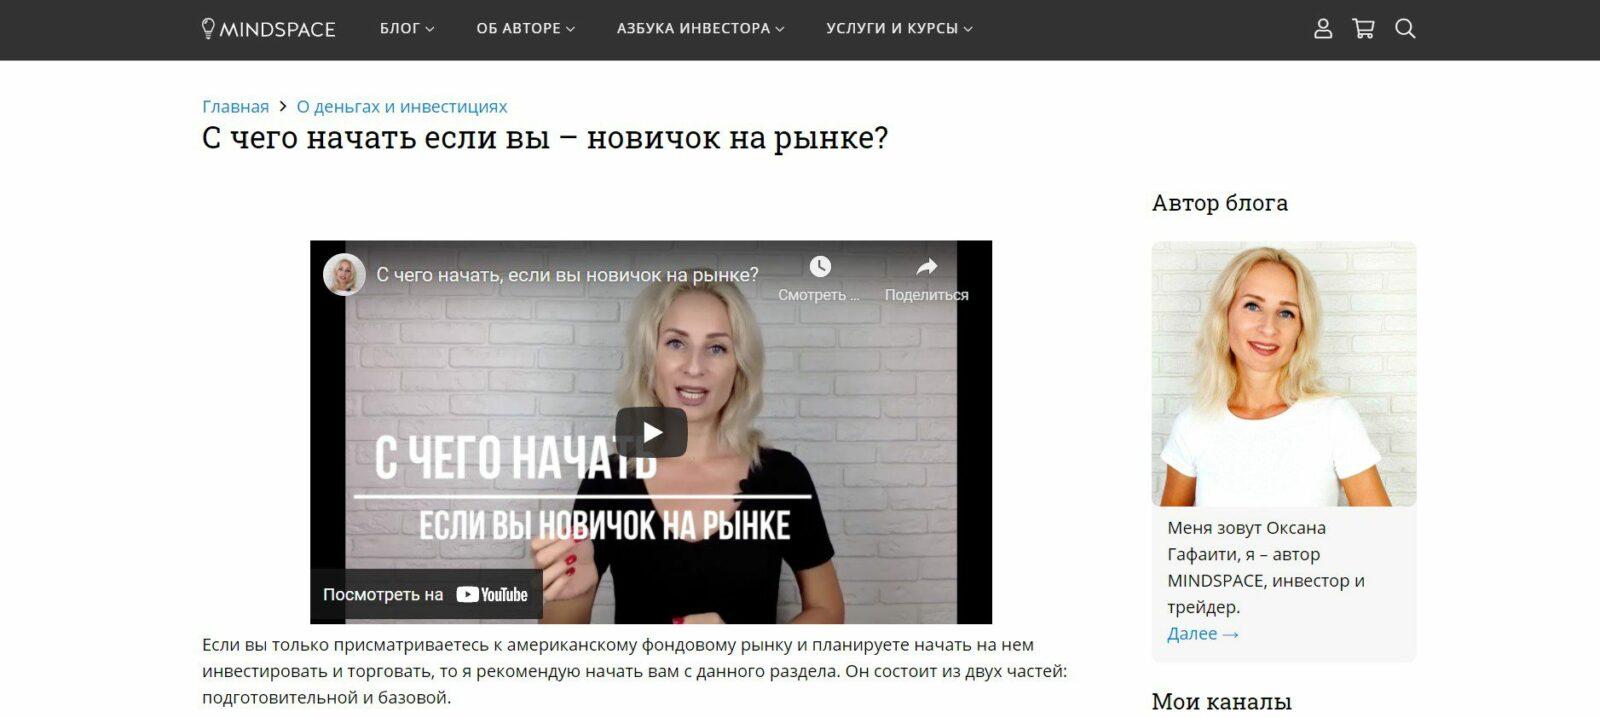 Оксана Гафаити Курс